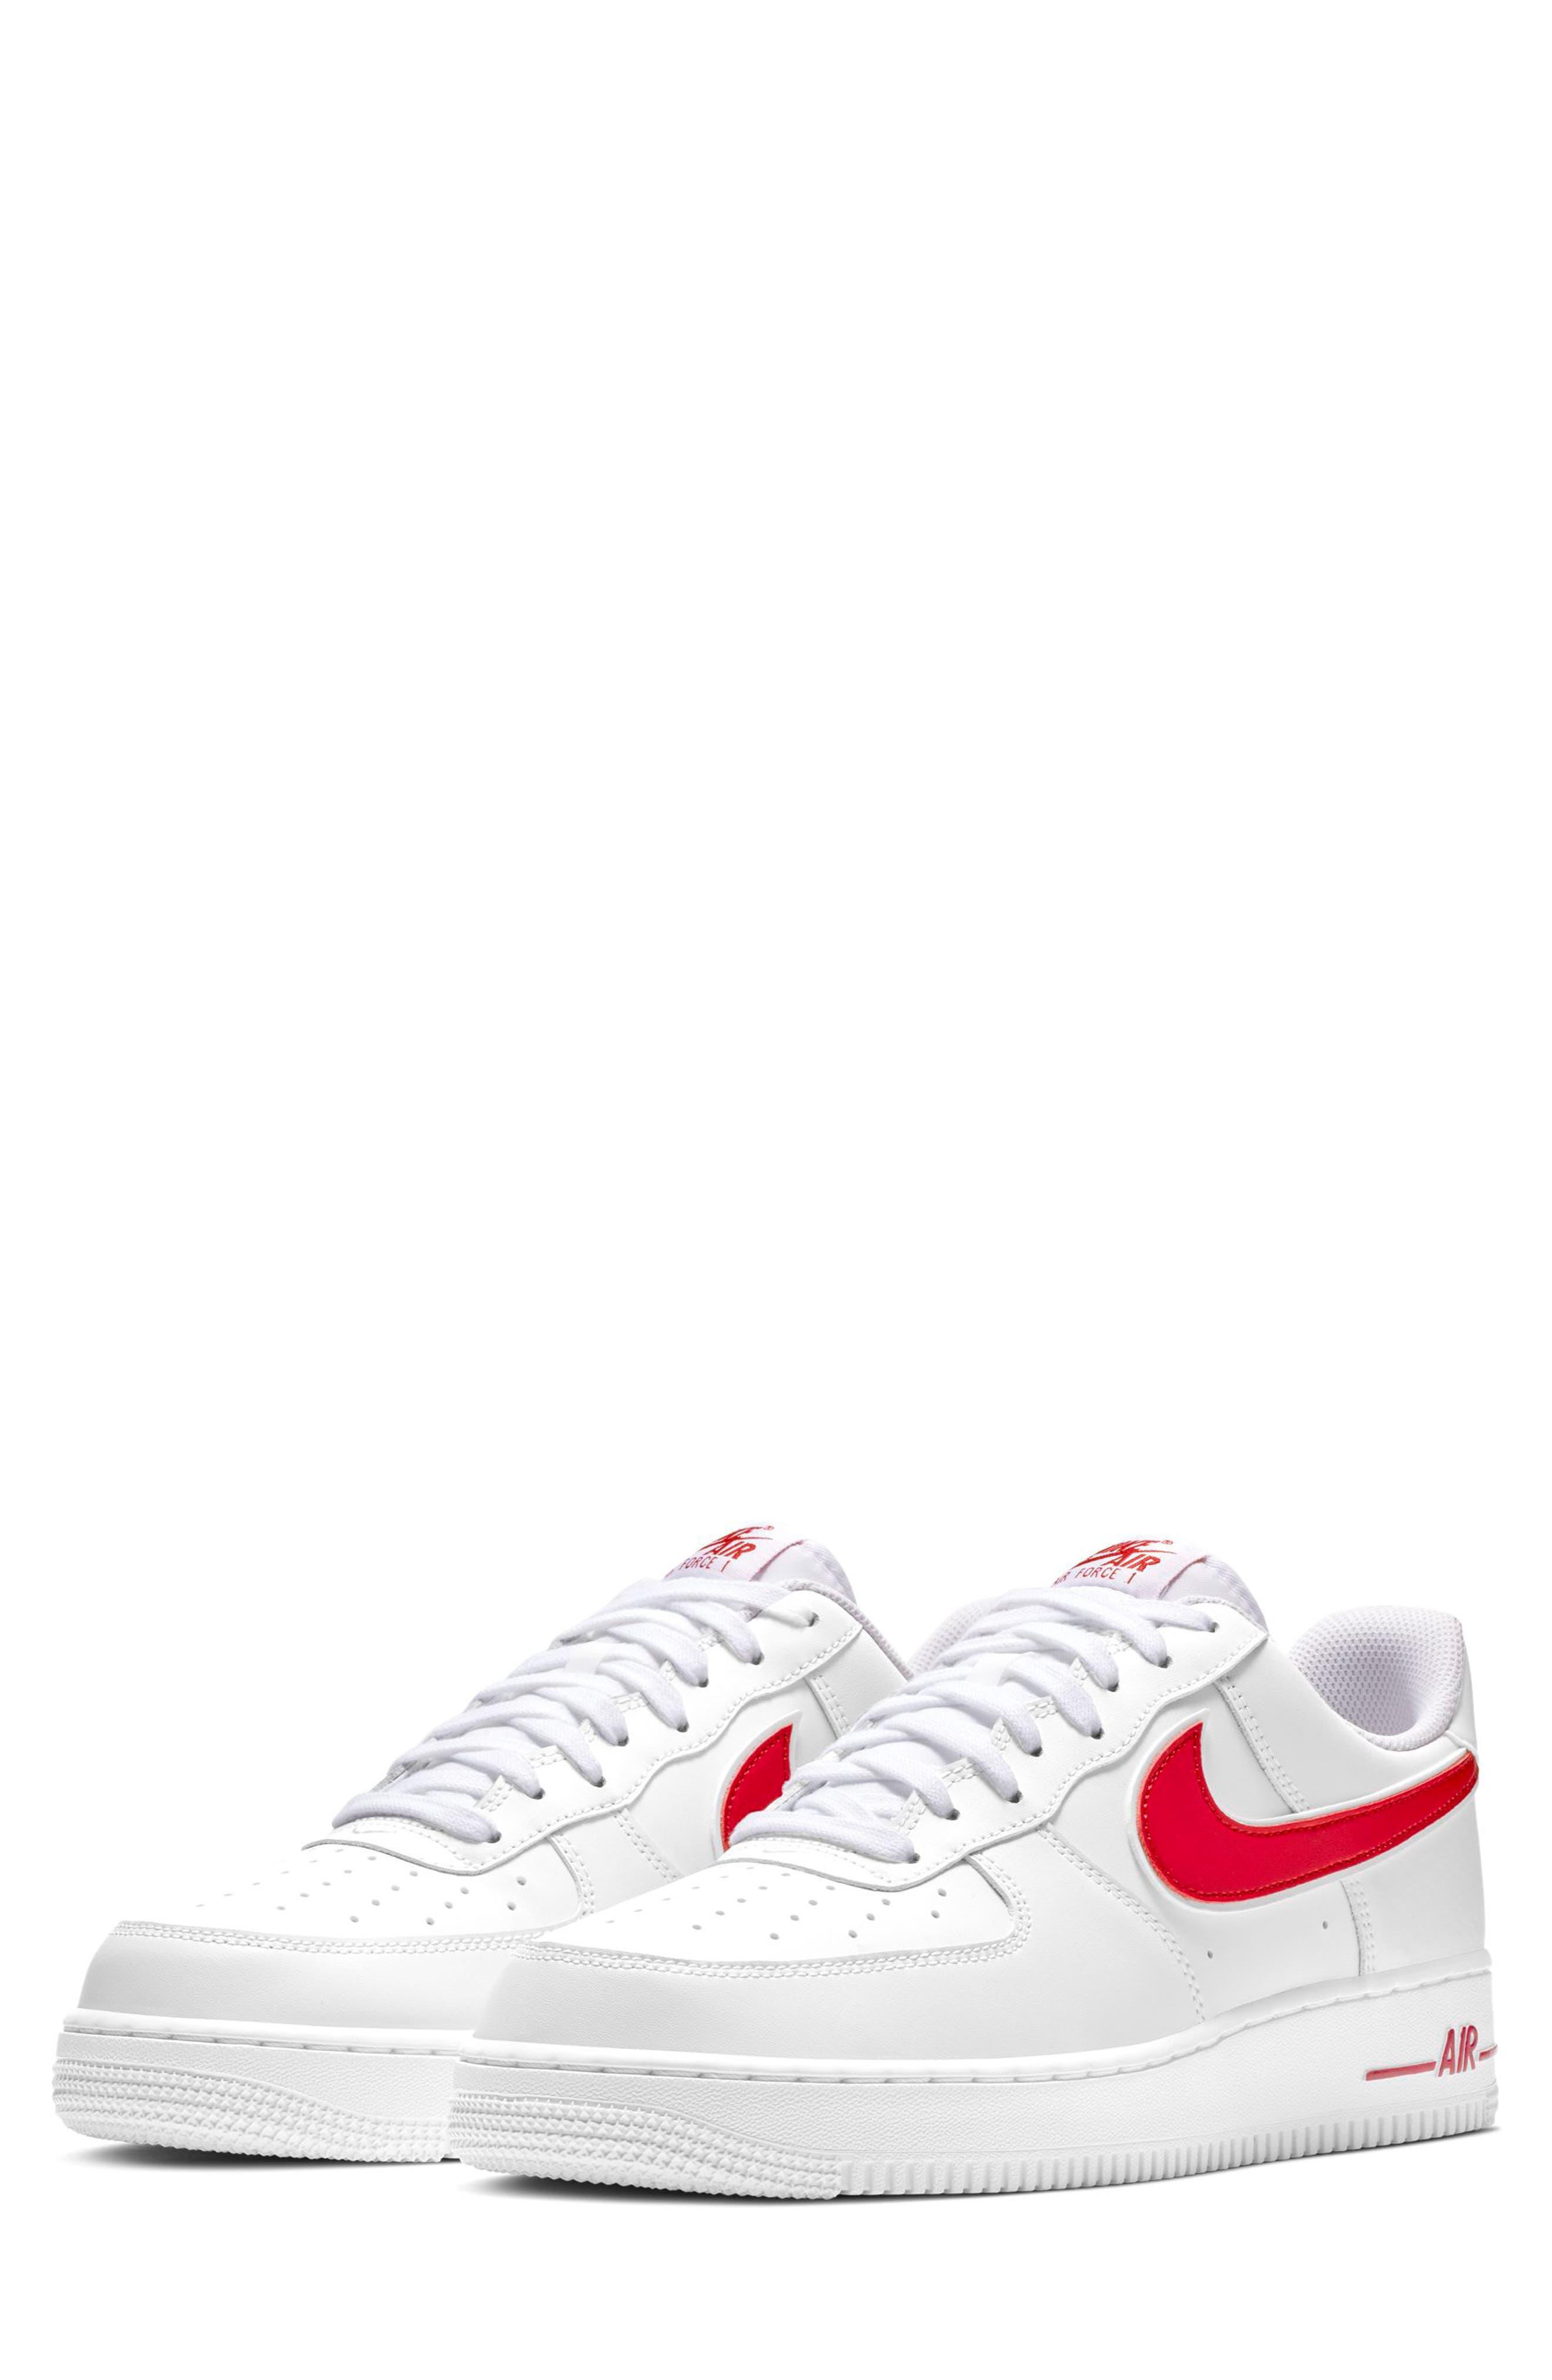 huge discount 877d4 a3531 nike sb blazer zoom low skate shoe images clip art Nike Air Zoom Vapor X  Men s Tennis ...